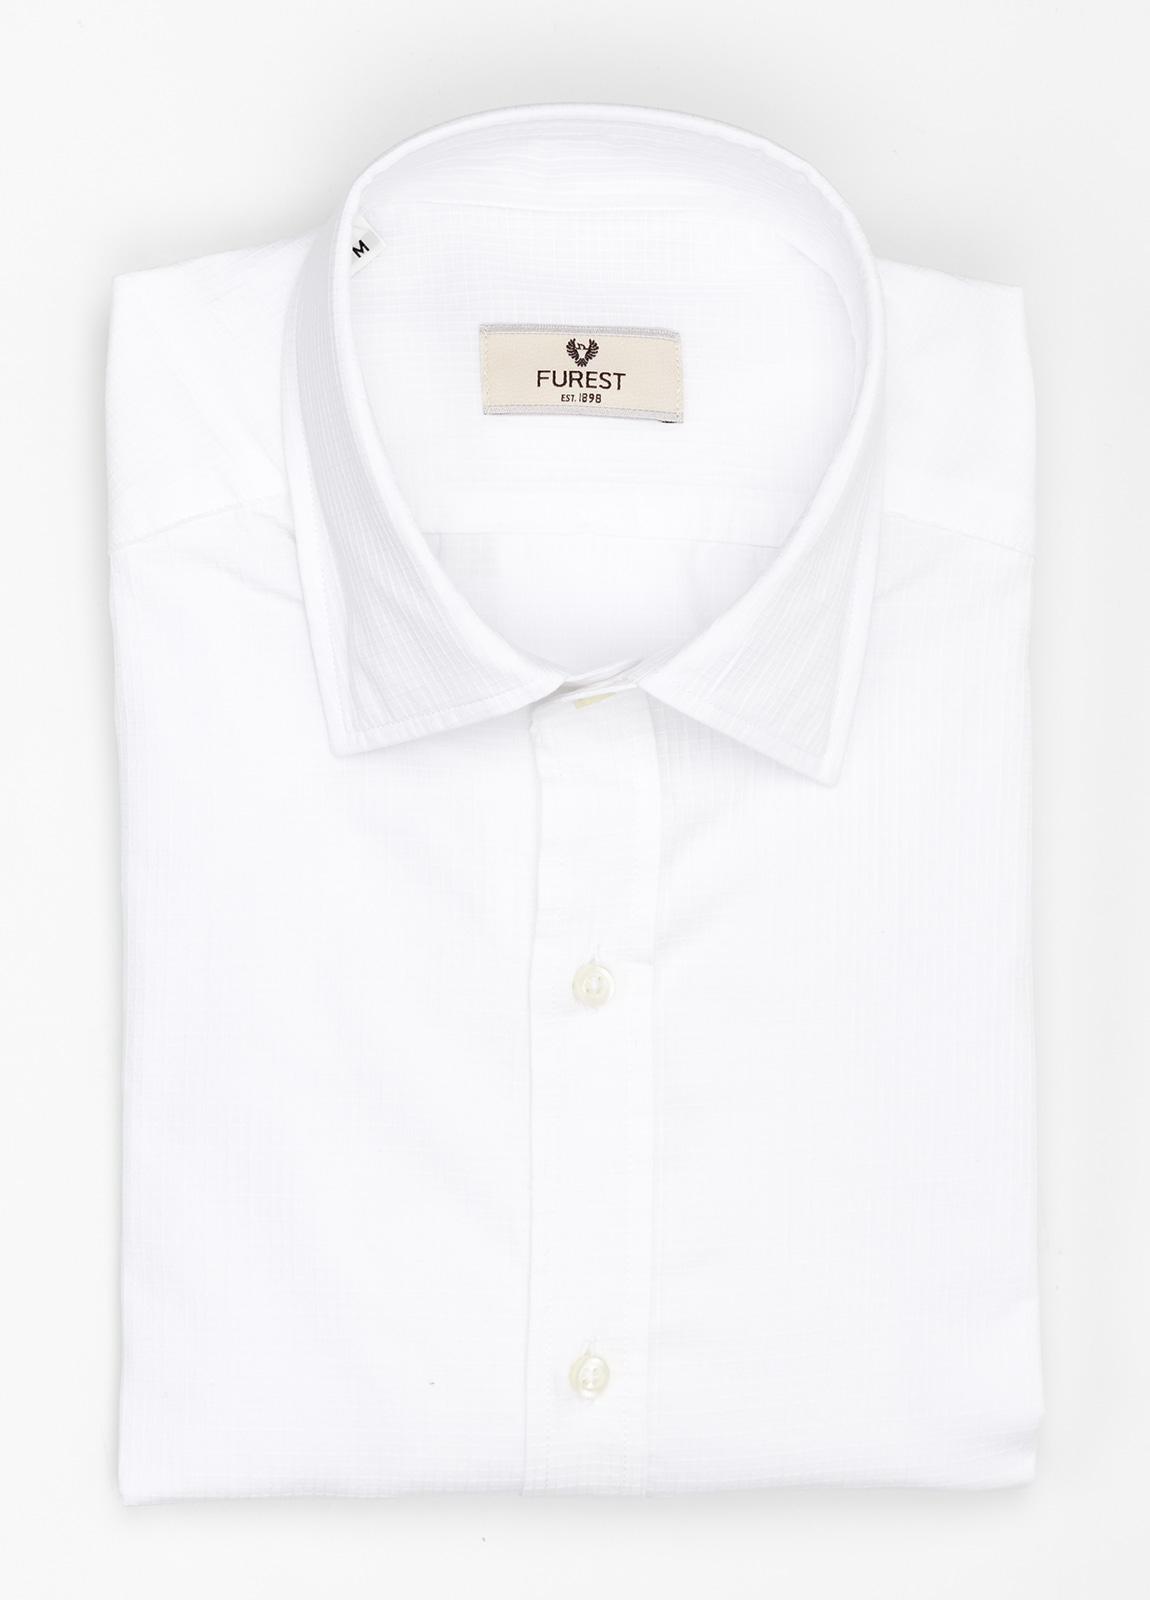 Camisa Leisure Wear SLIM FIT modelo PORTO micro raya color blanco. 100% Algodón.